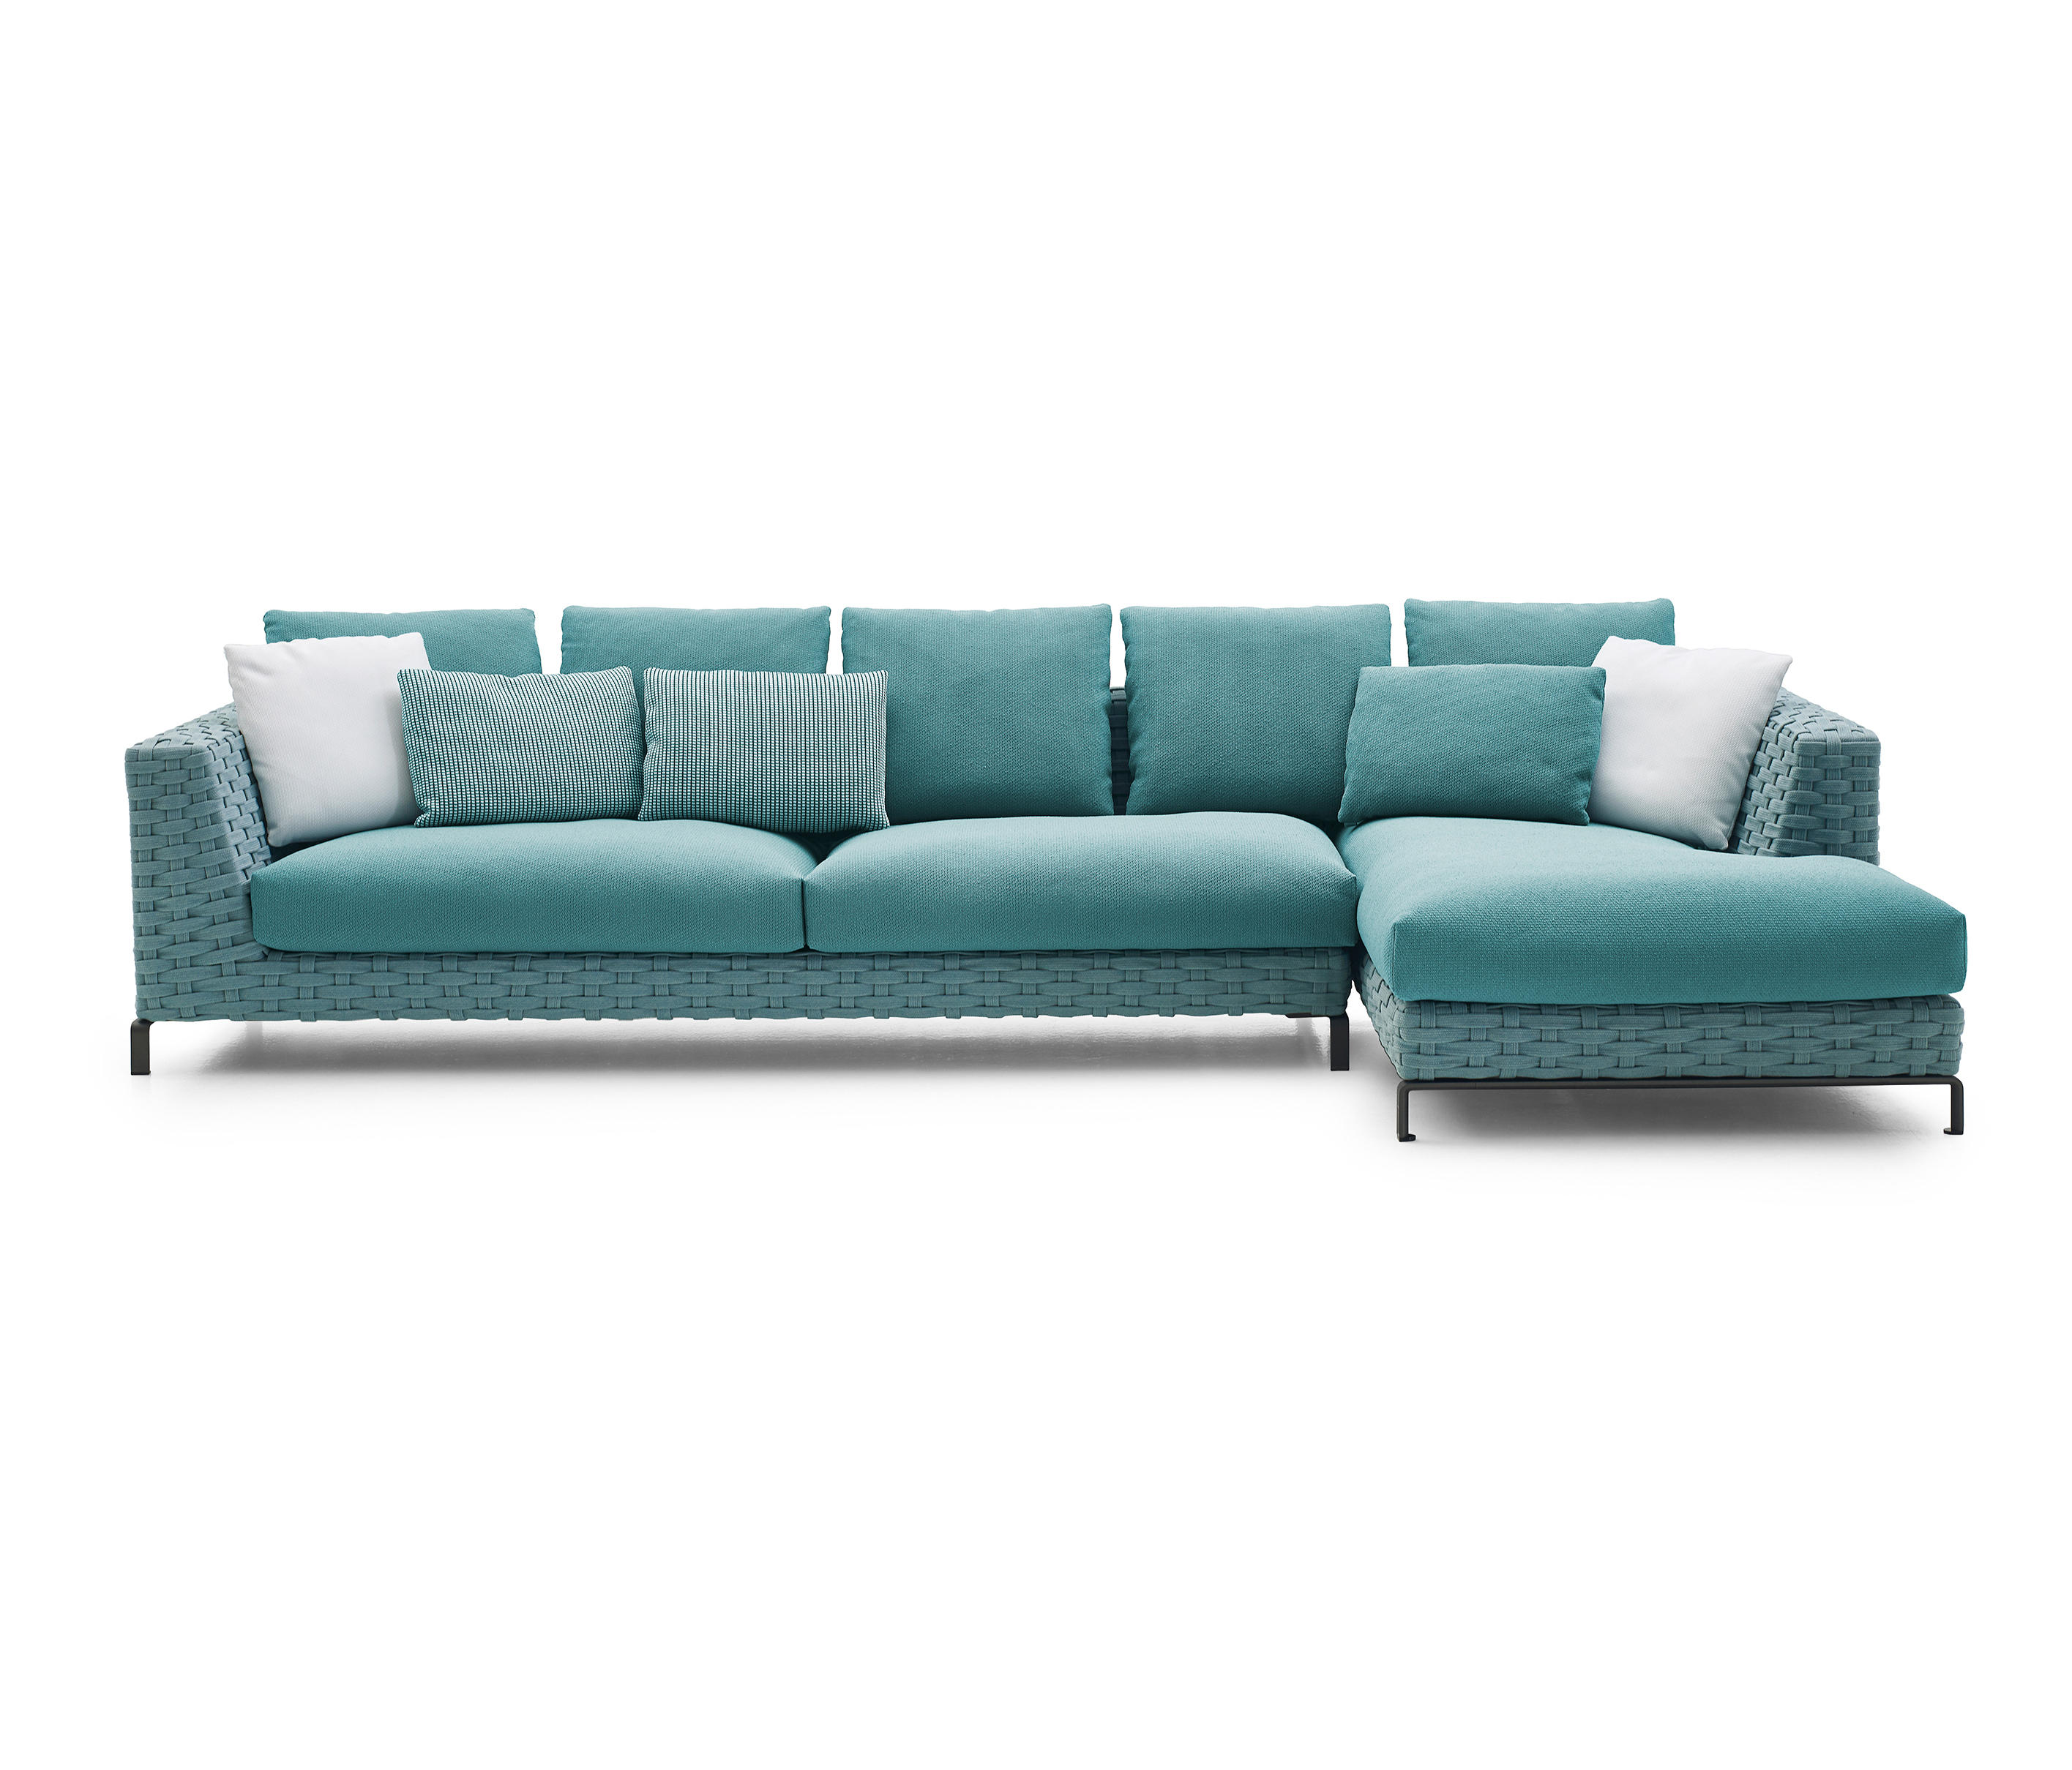 Ray outdoor fabric by bb italia sofas